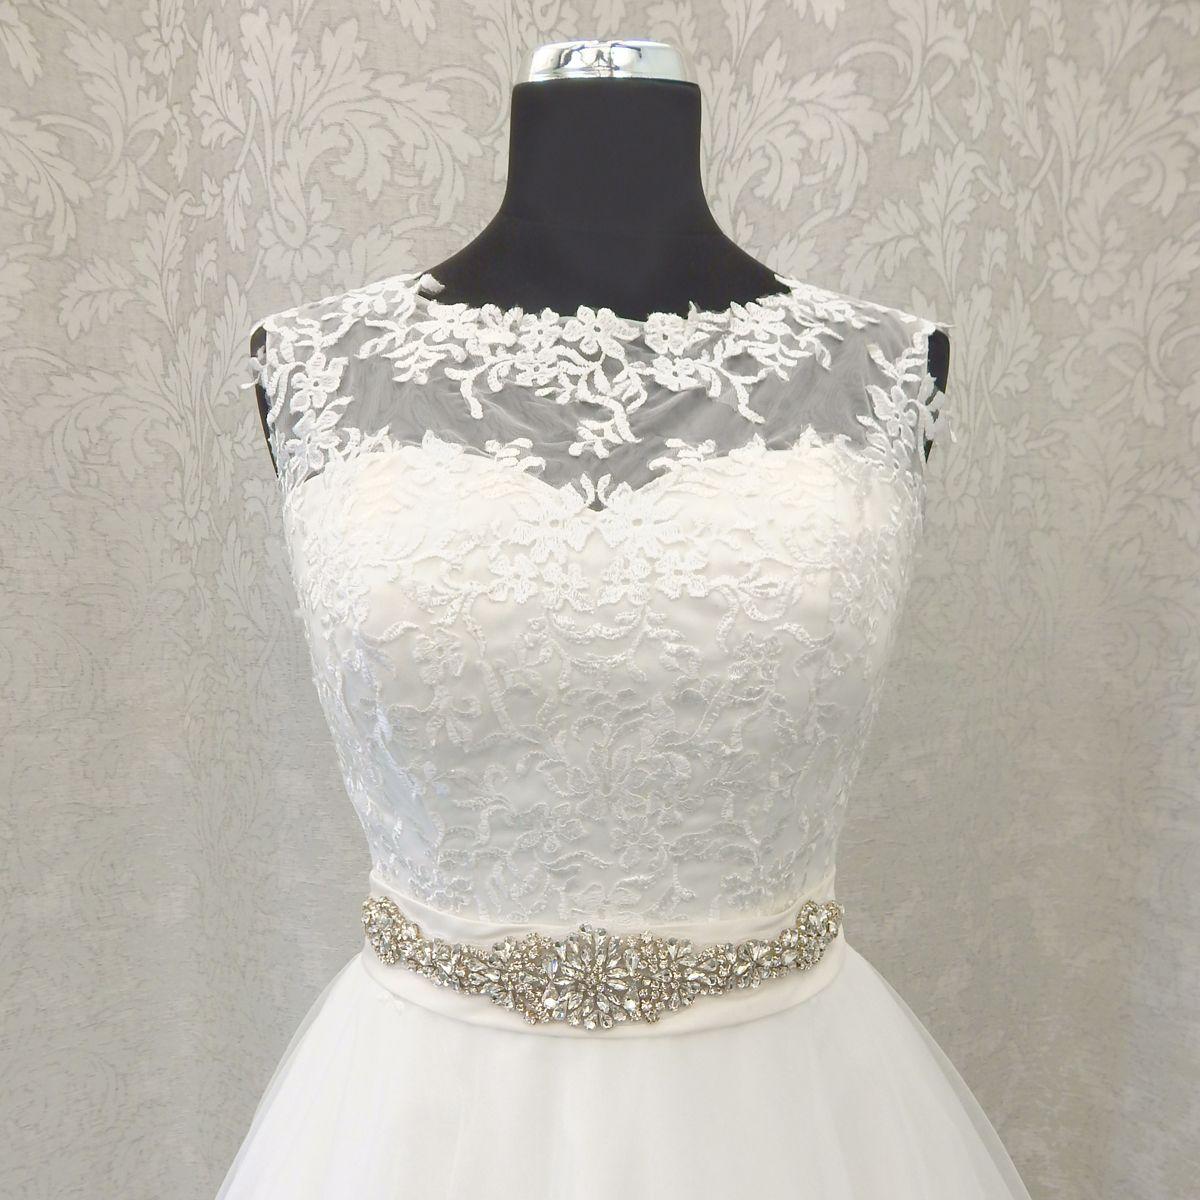 Pearl belt for wedding dress  AMBER diamante wedding belt  Belts  Pinterest  Wedding dress